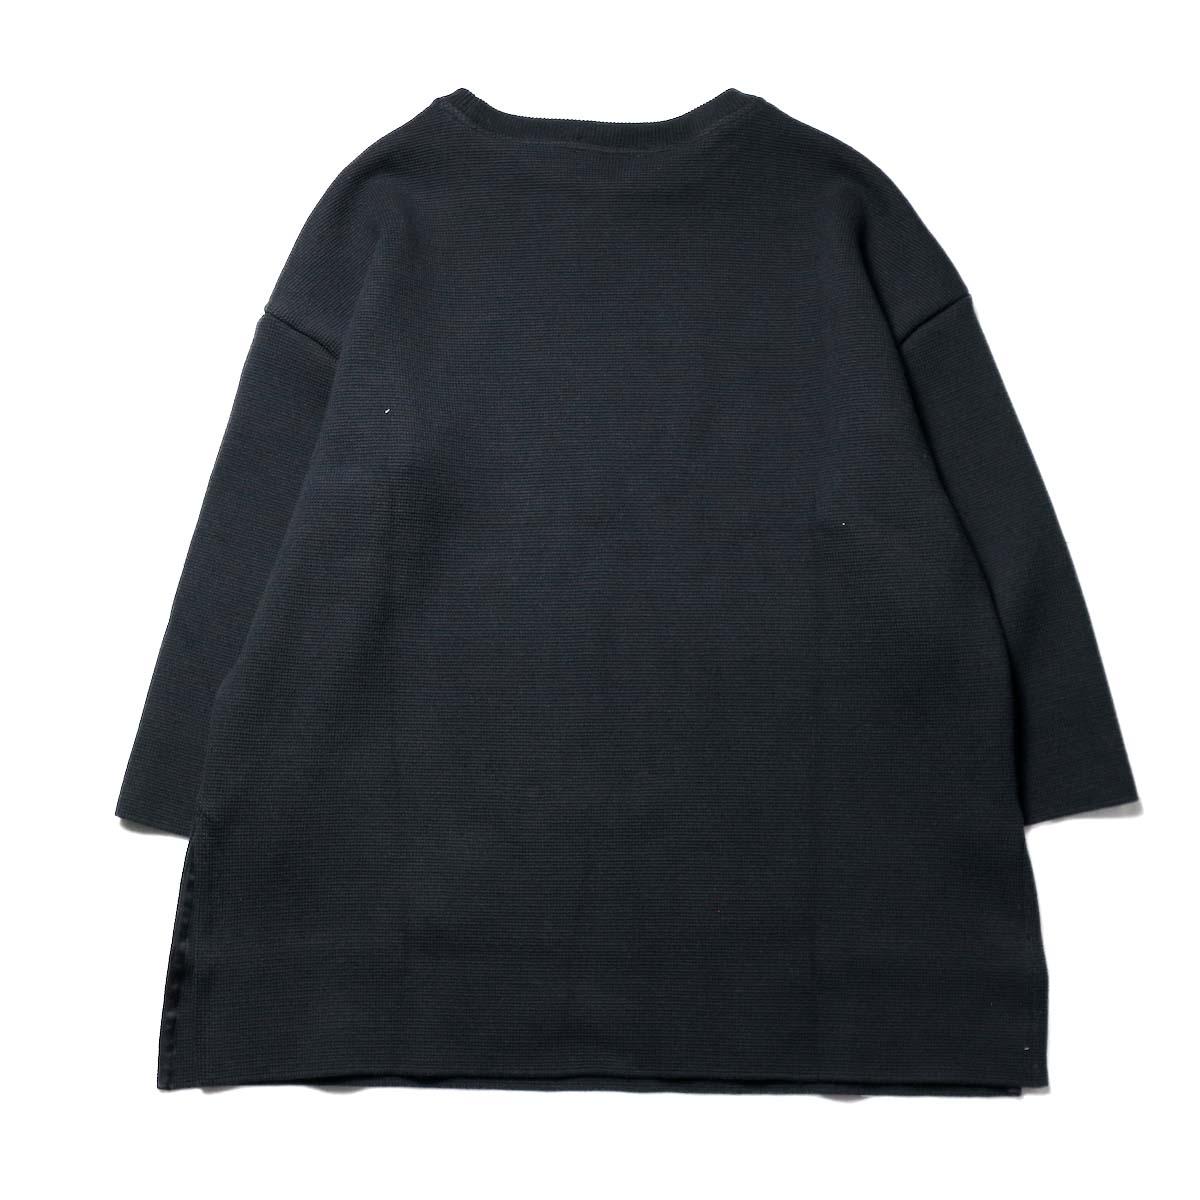 alvana / MILANO 2WAY TUNIC P.O (Black)背面